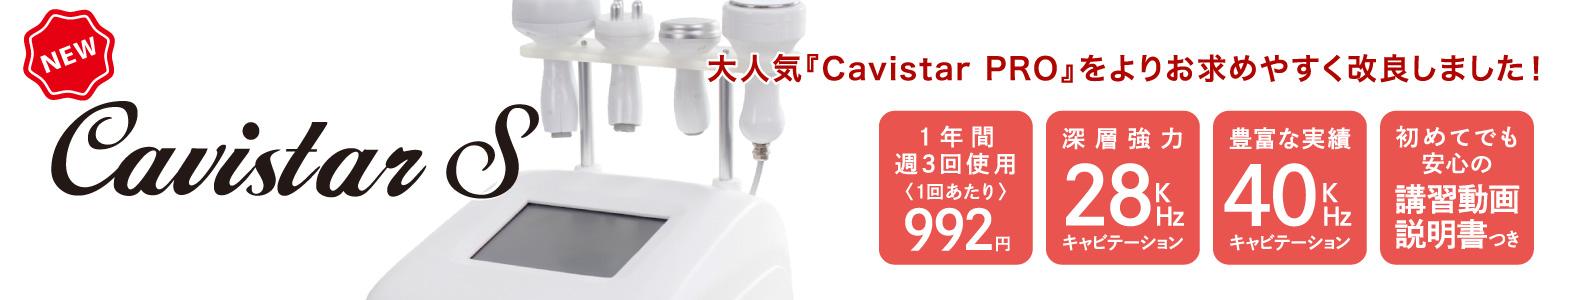 Cavistar S